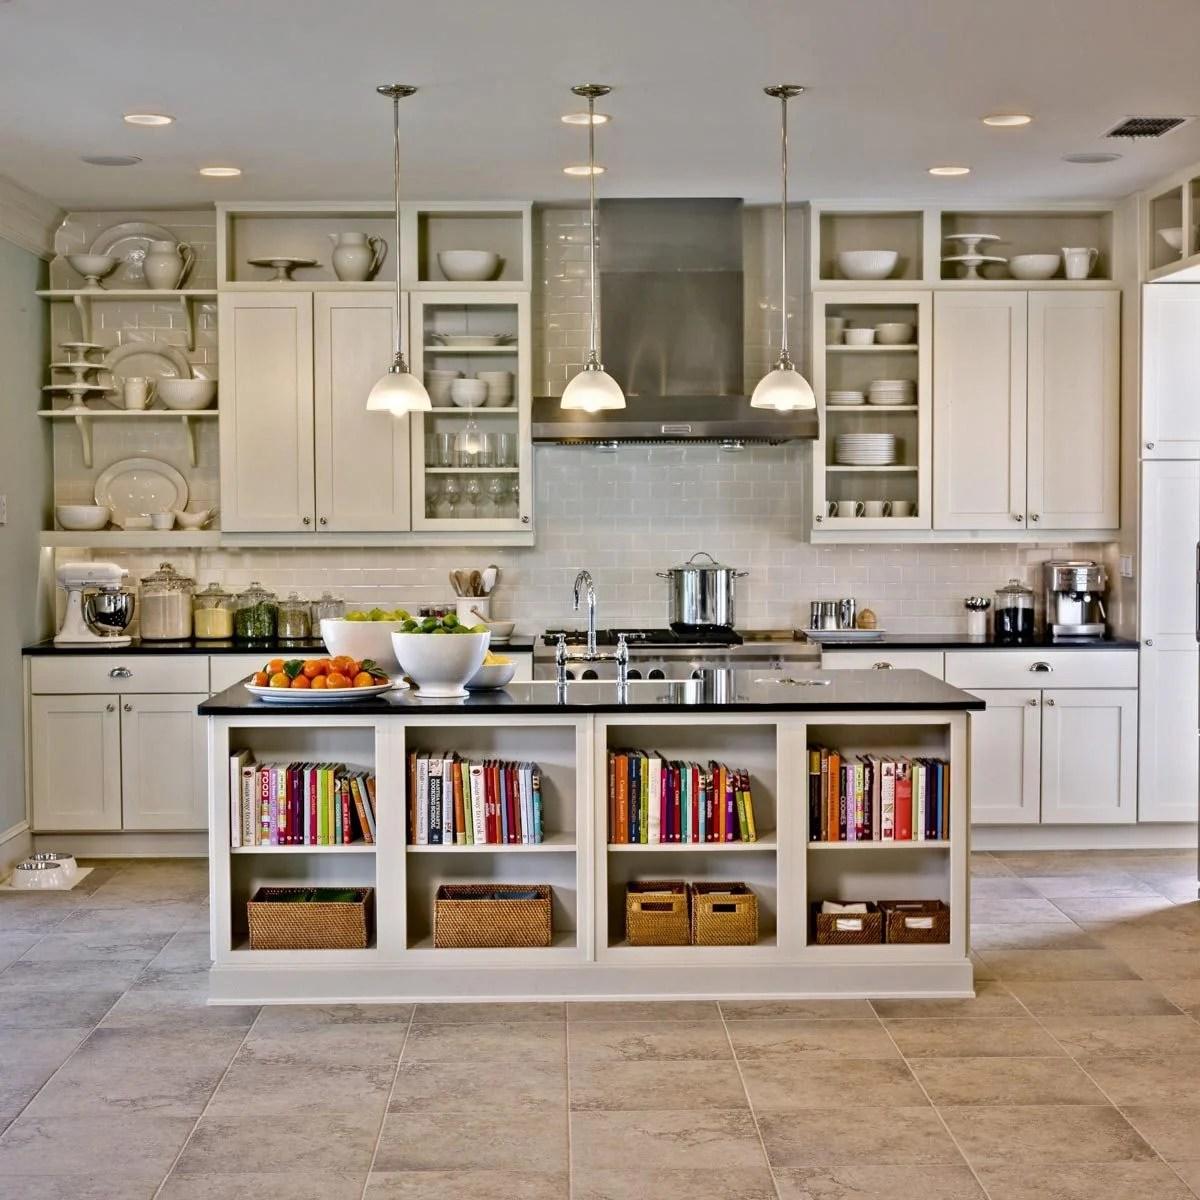 Manly Bookshelf Island Diy Kitchen Island Diy Kitchen Islands Family Handyman Kitchen Islands Houzz Kitchen Islands Seating kitchen Best Kitchen Islands